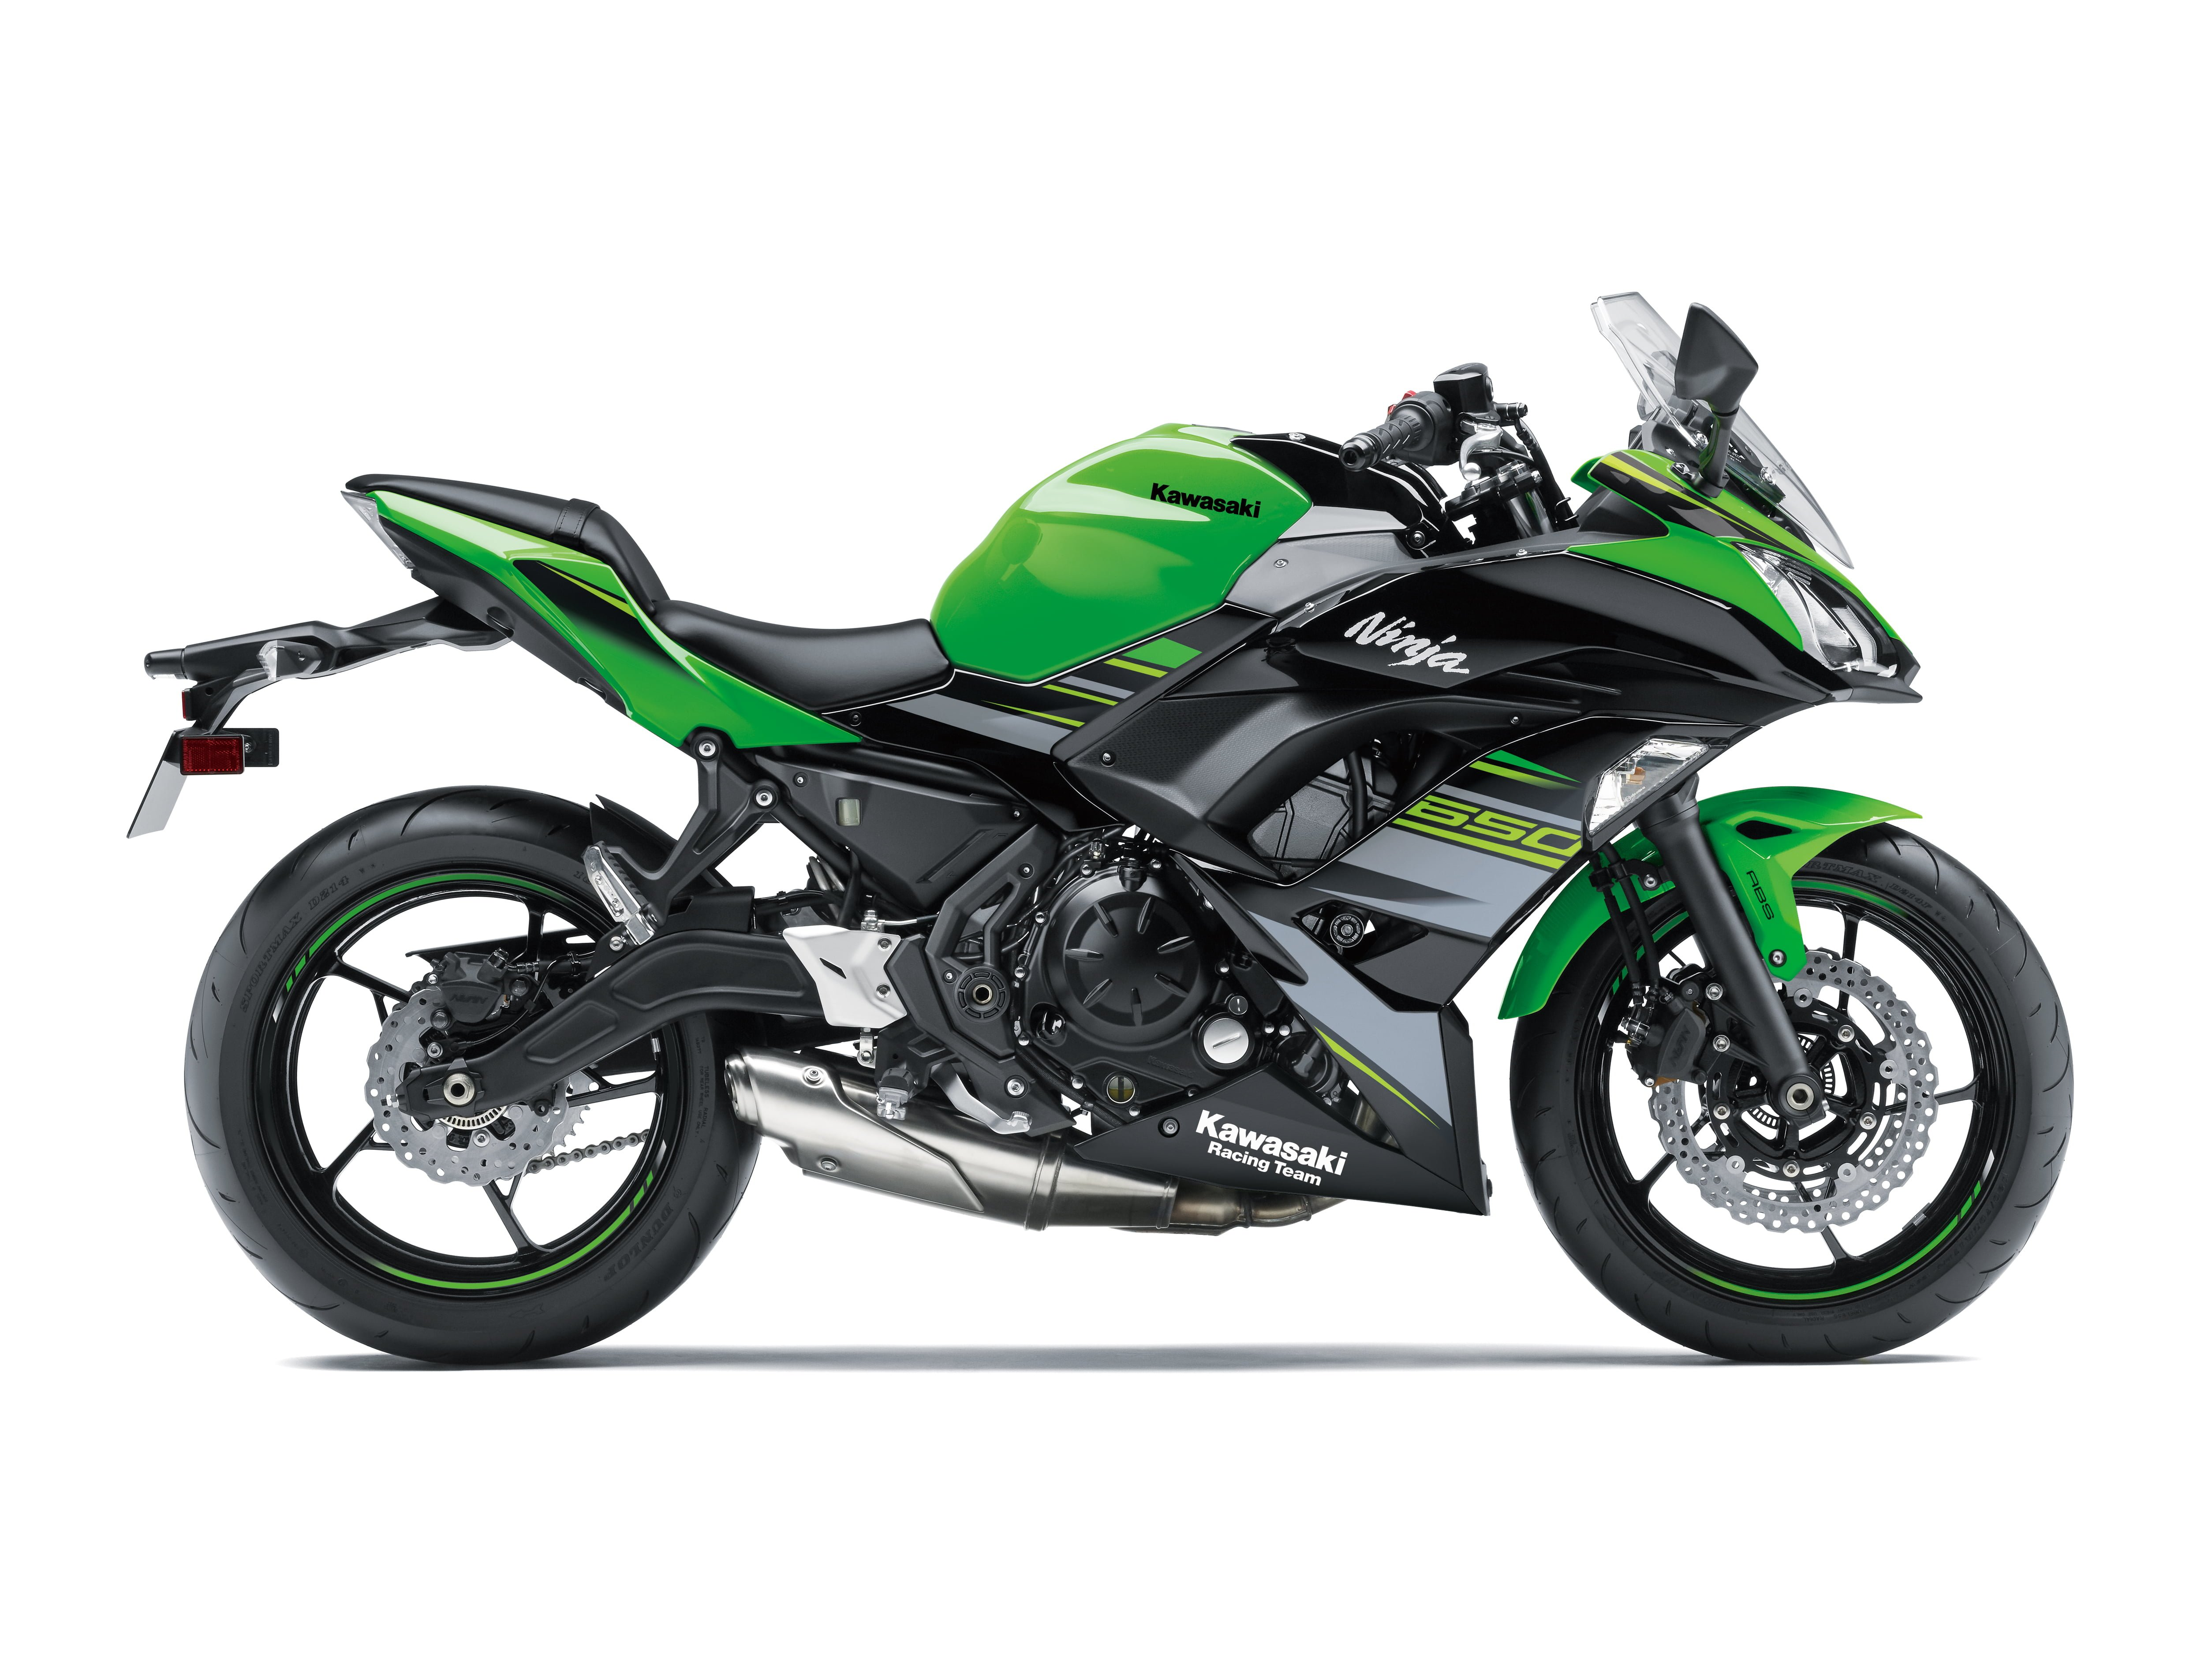 Kawasaki Riding Gear India